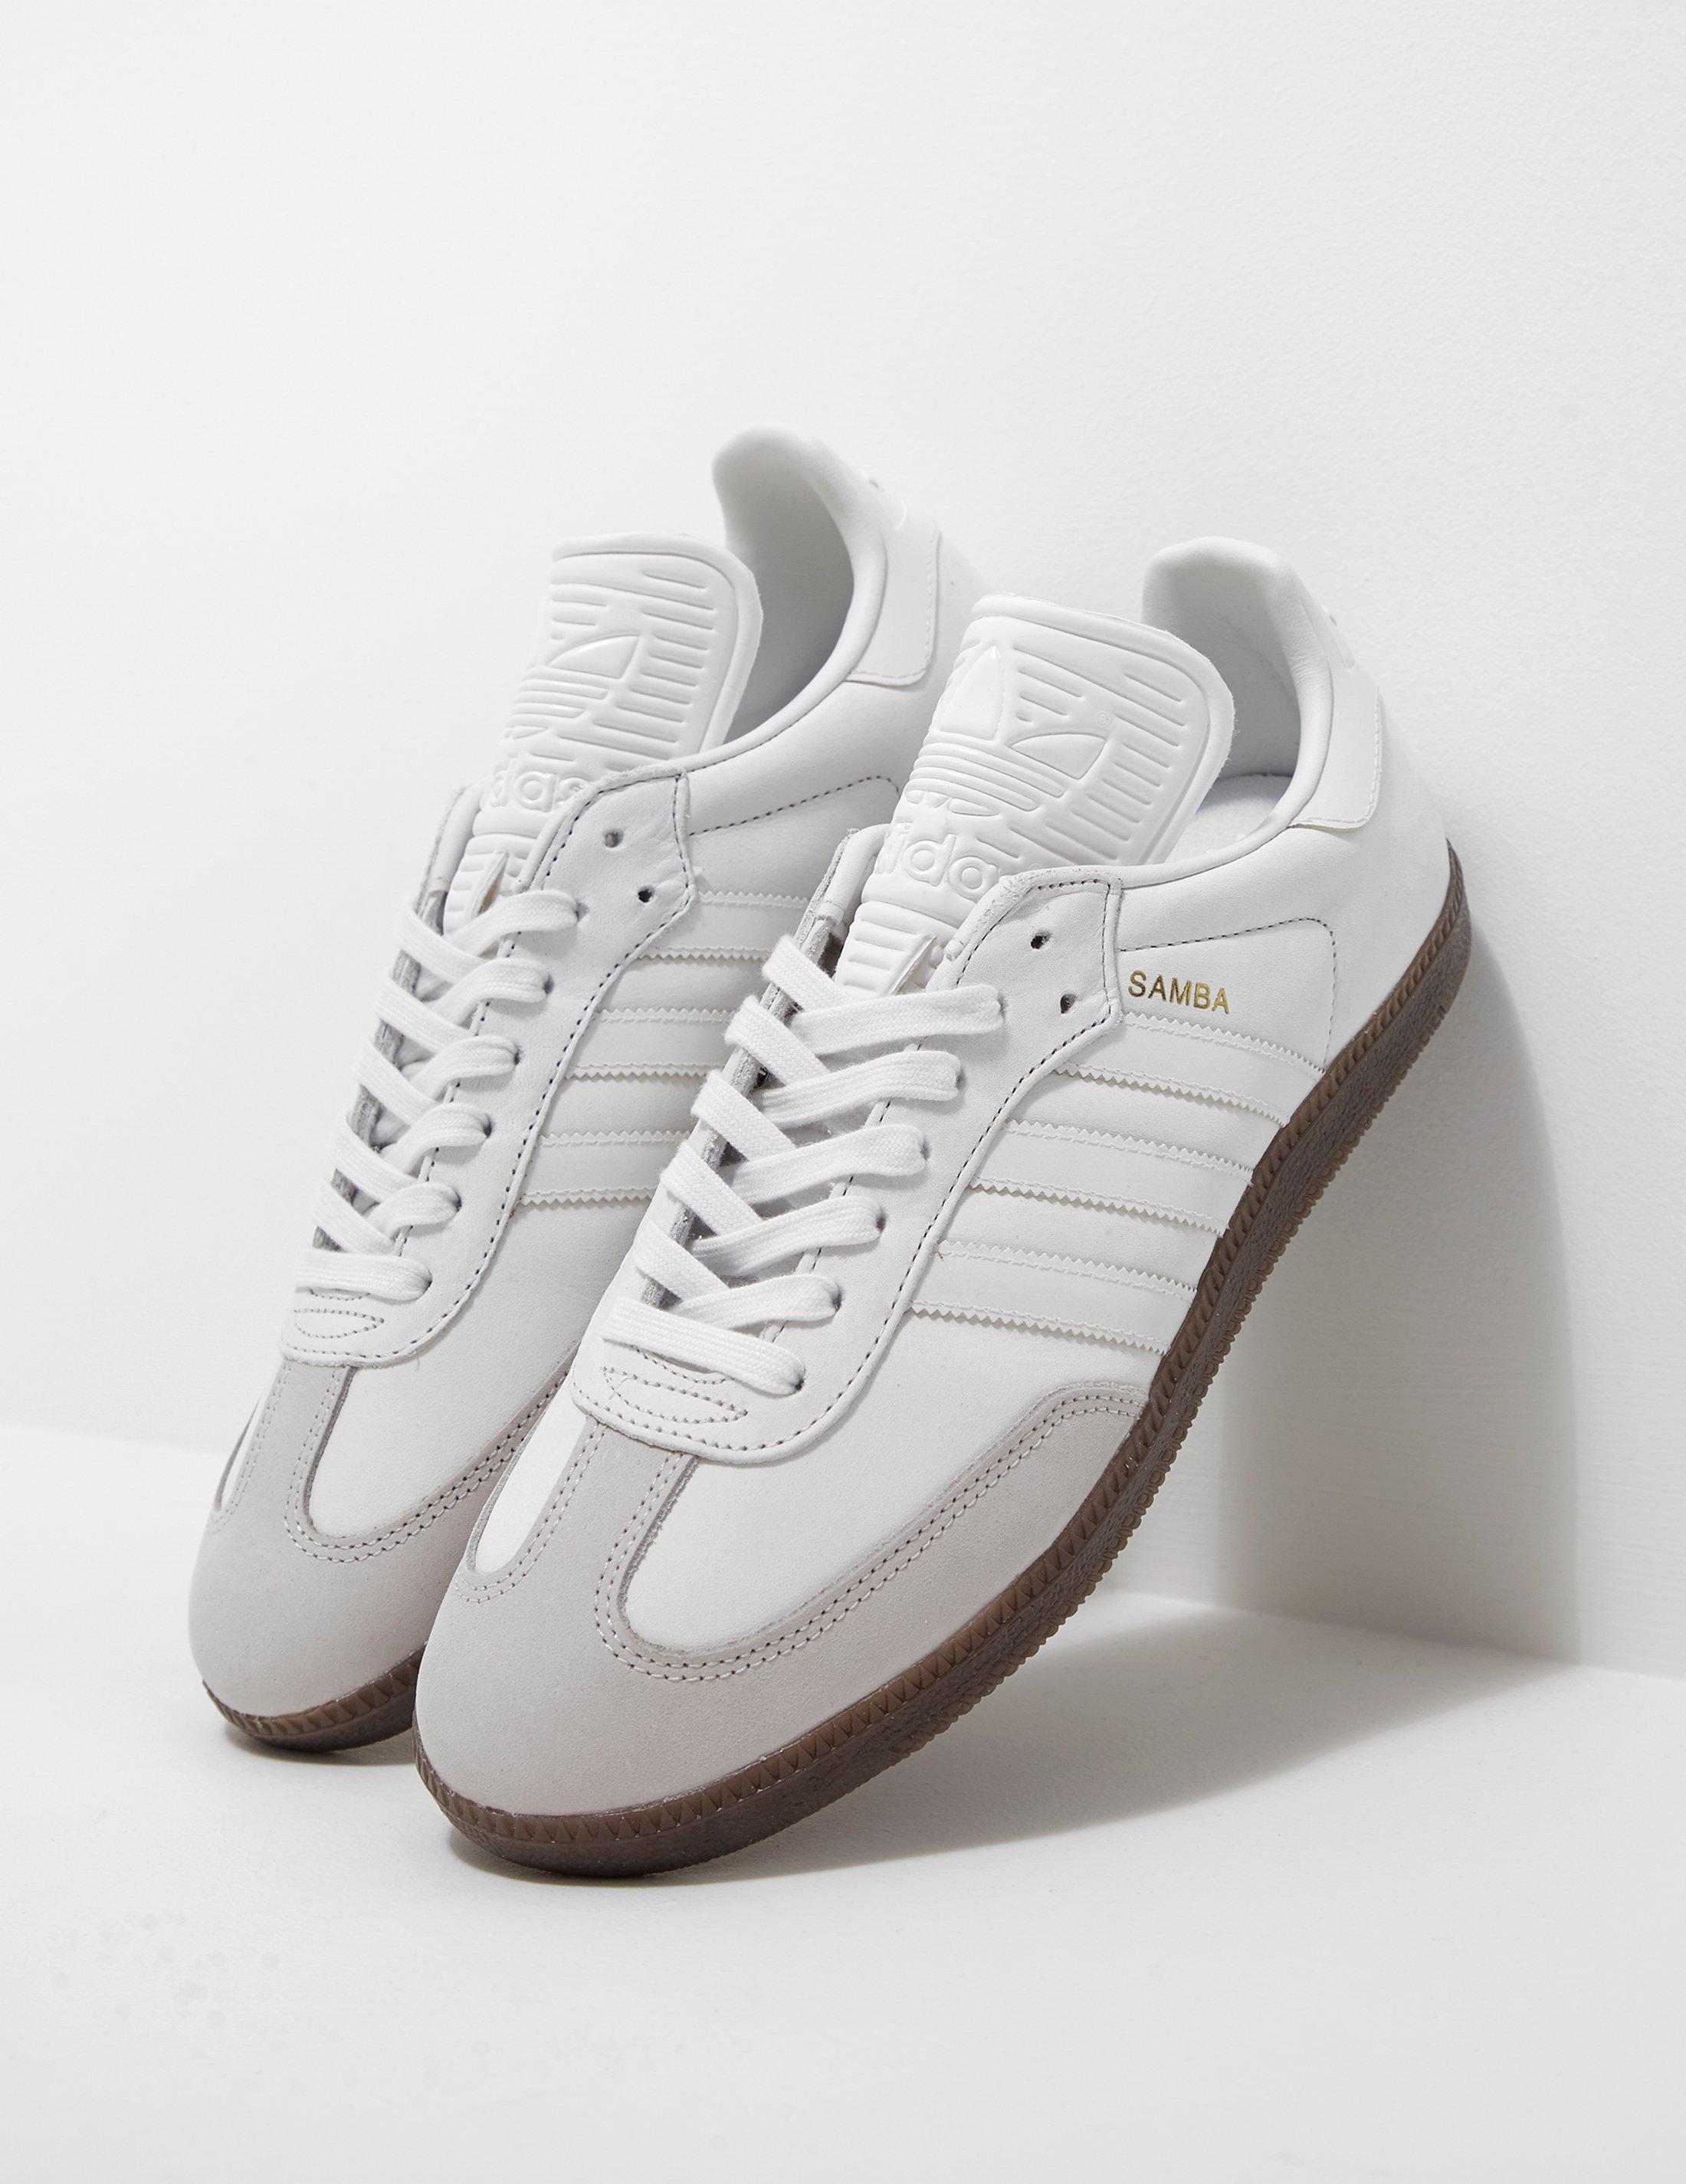 9541b2358 ... shoes white core black clear granite bz0057 8 d 02595 f448f  canada  gallery. previously sold at tessuti uk mens adidas samba ca082 8e3d2